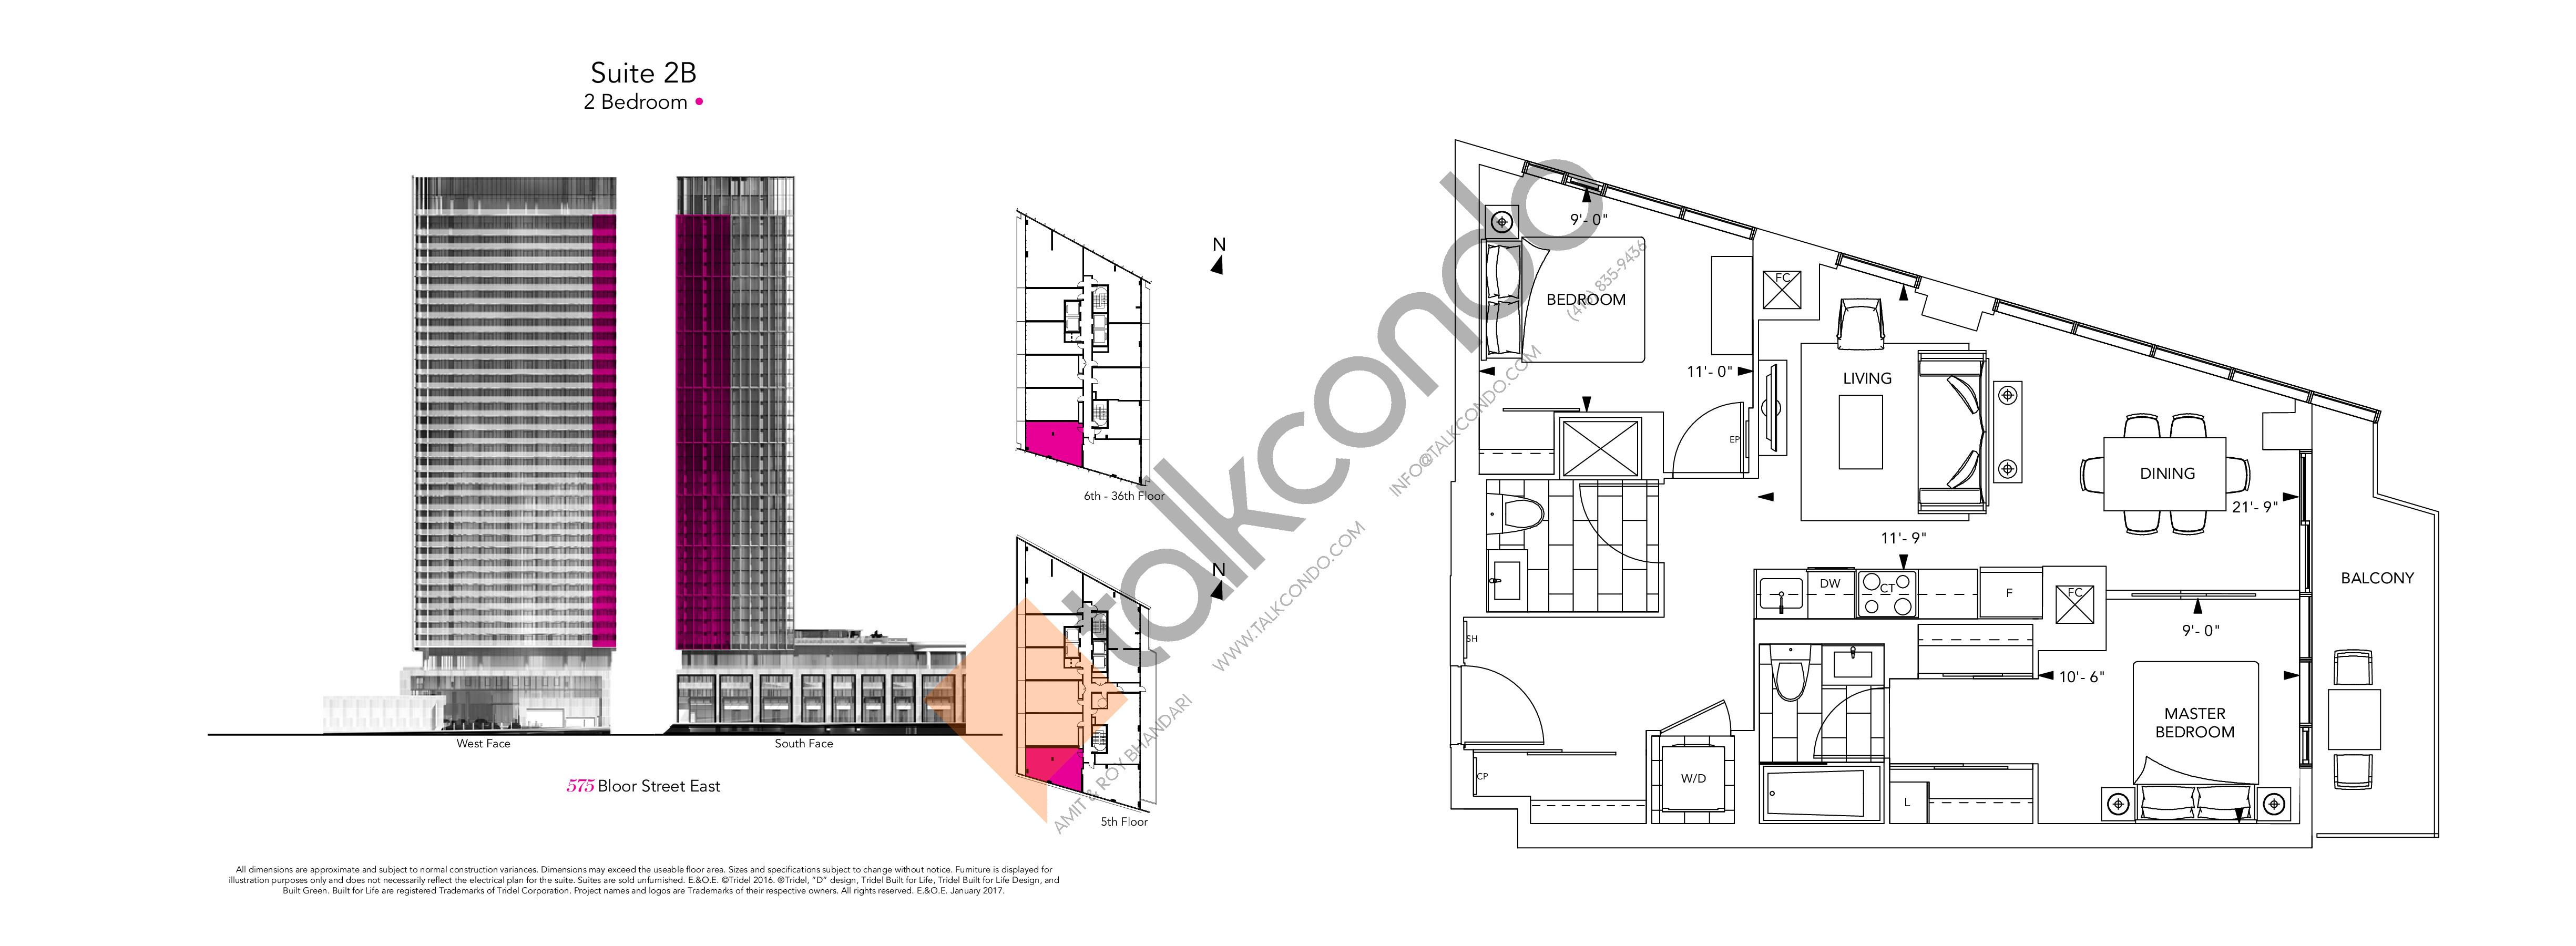 2B Floor Plan at Via Bloor Condos - 780 sq.ft